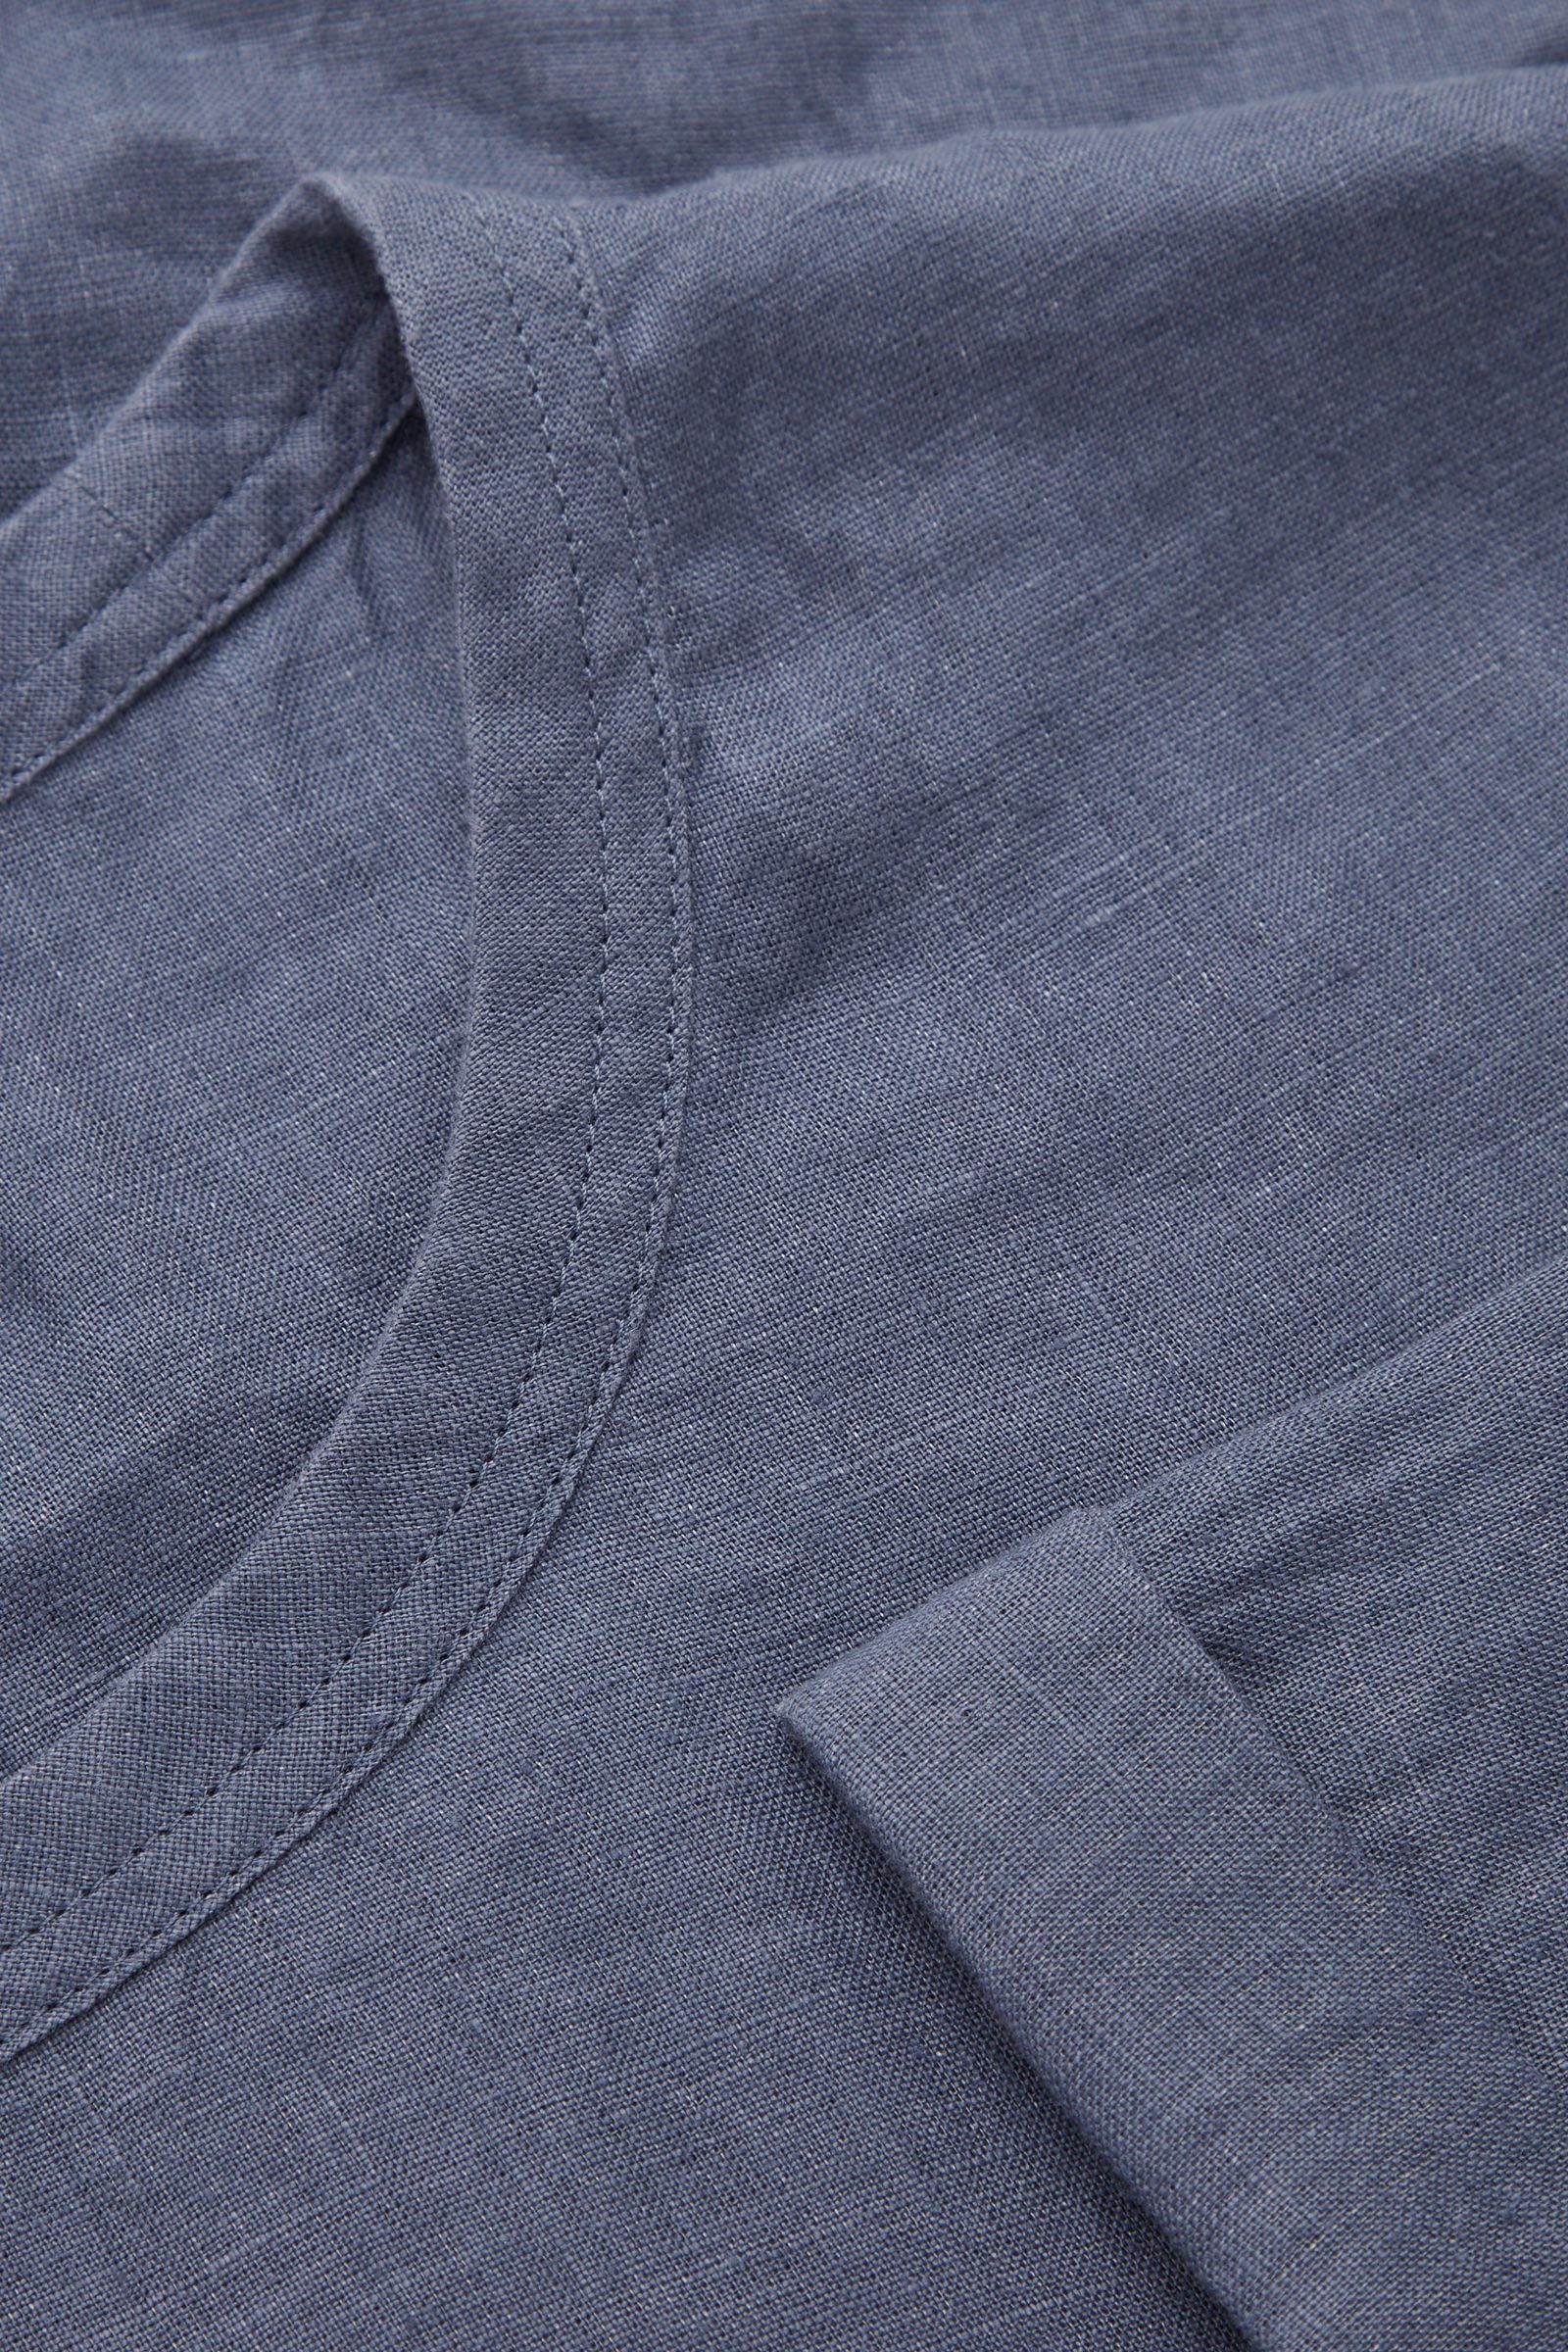 COS 릴랙스드 핏 헴프 티셔츠의 블루컬러 Detail입니다.